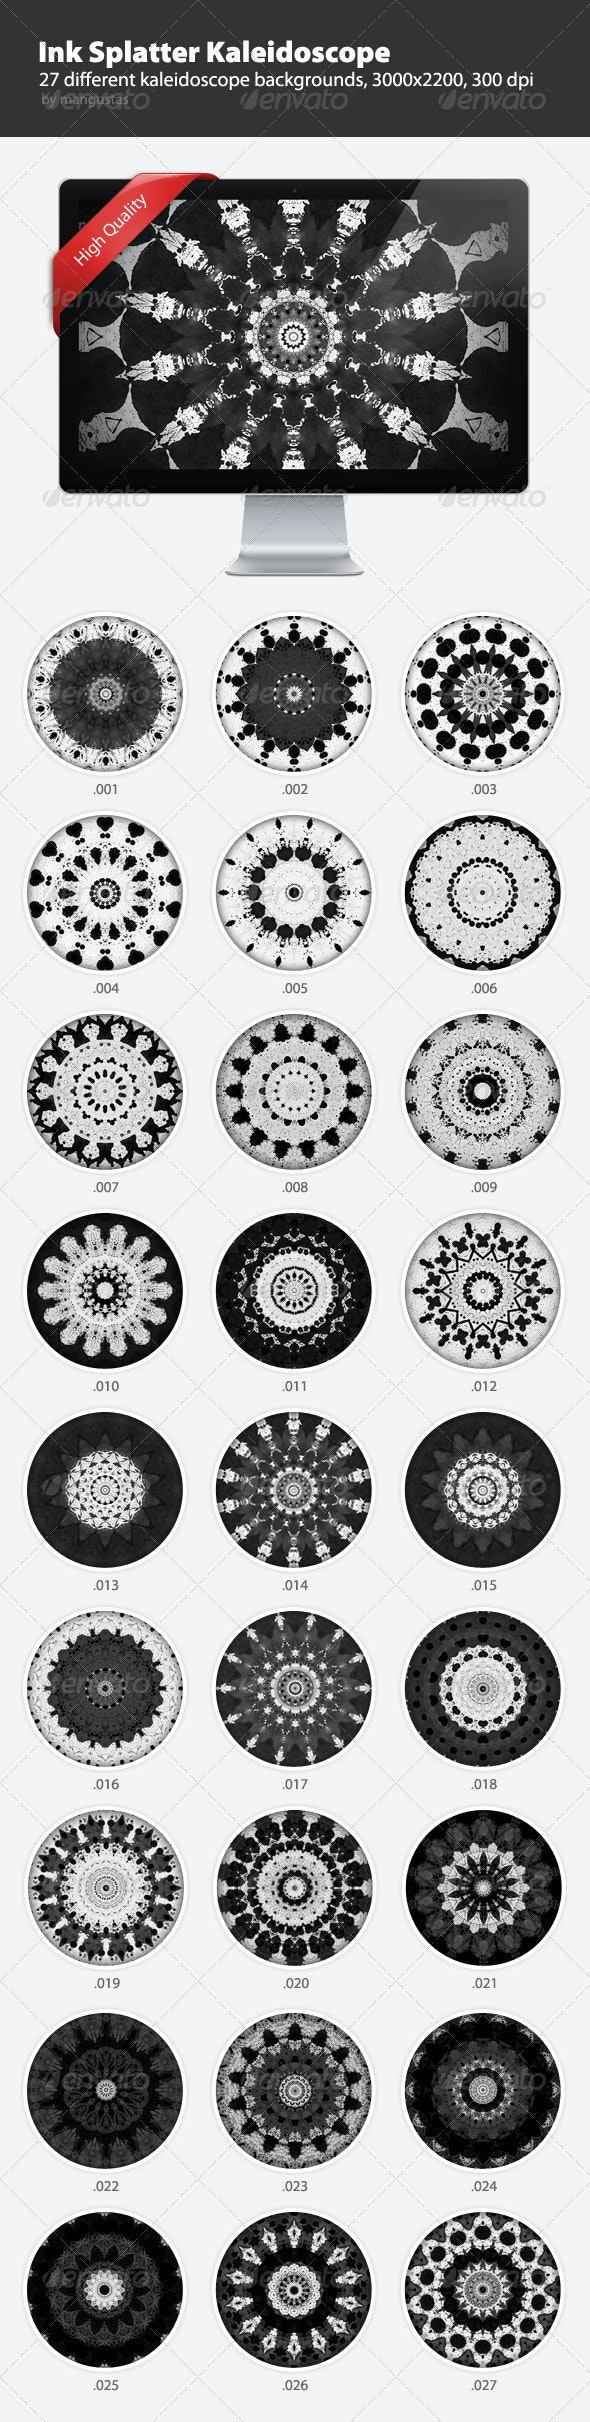 Ink Splatter Kaleidoscope Backgrounds - Abstract Backgrounds